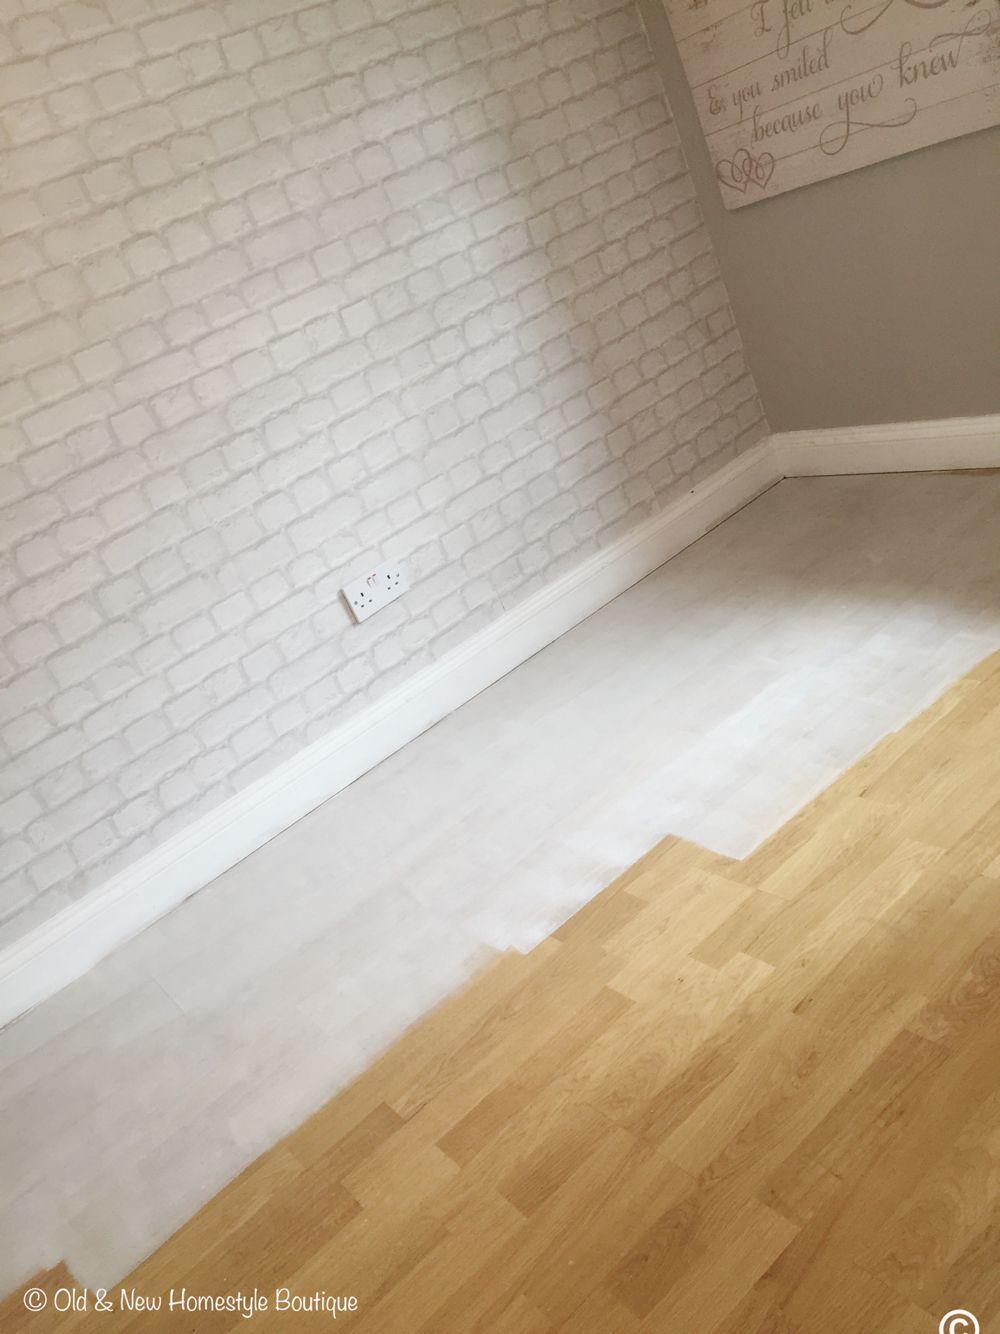 Quick N Easy Chalk Paint On Laminate Flooring Bye Bye Pretend Pine Planks Hello White Floorboards Painting Laminate Floors Laminate Flooring Flooring